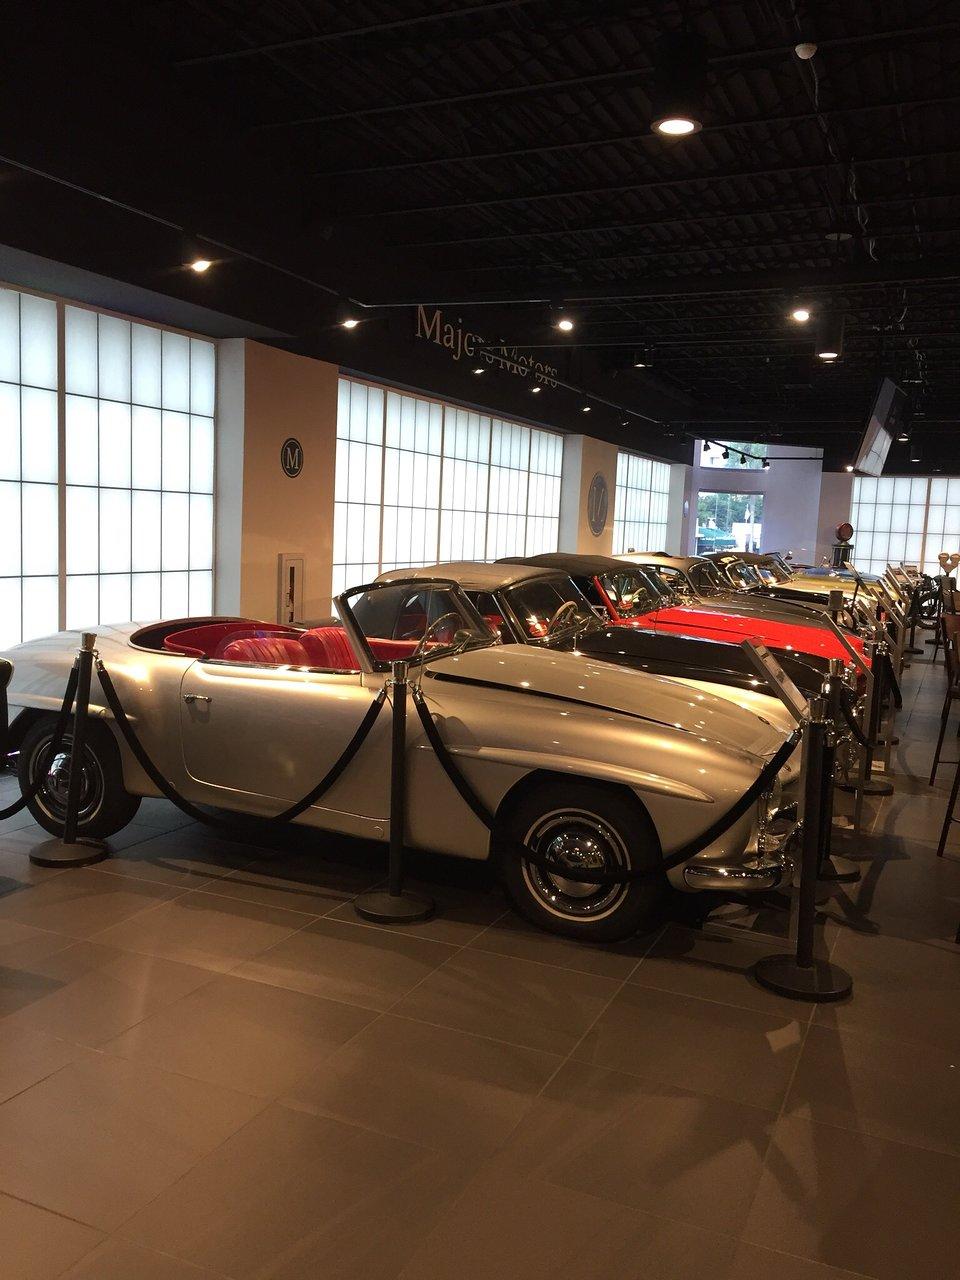 Majors Motors Orlando 2020 All You Need To Know Before You Go With Photos Tripadvisor